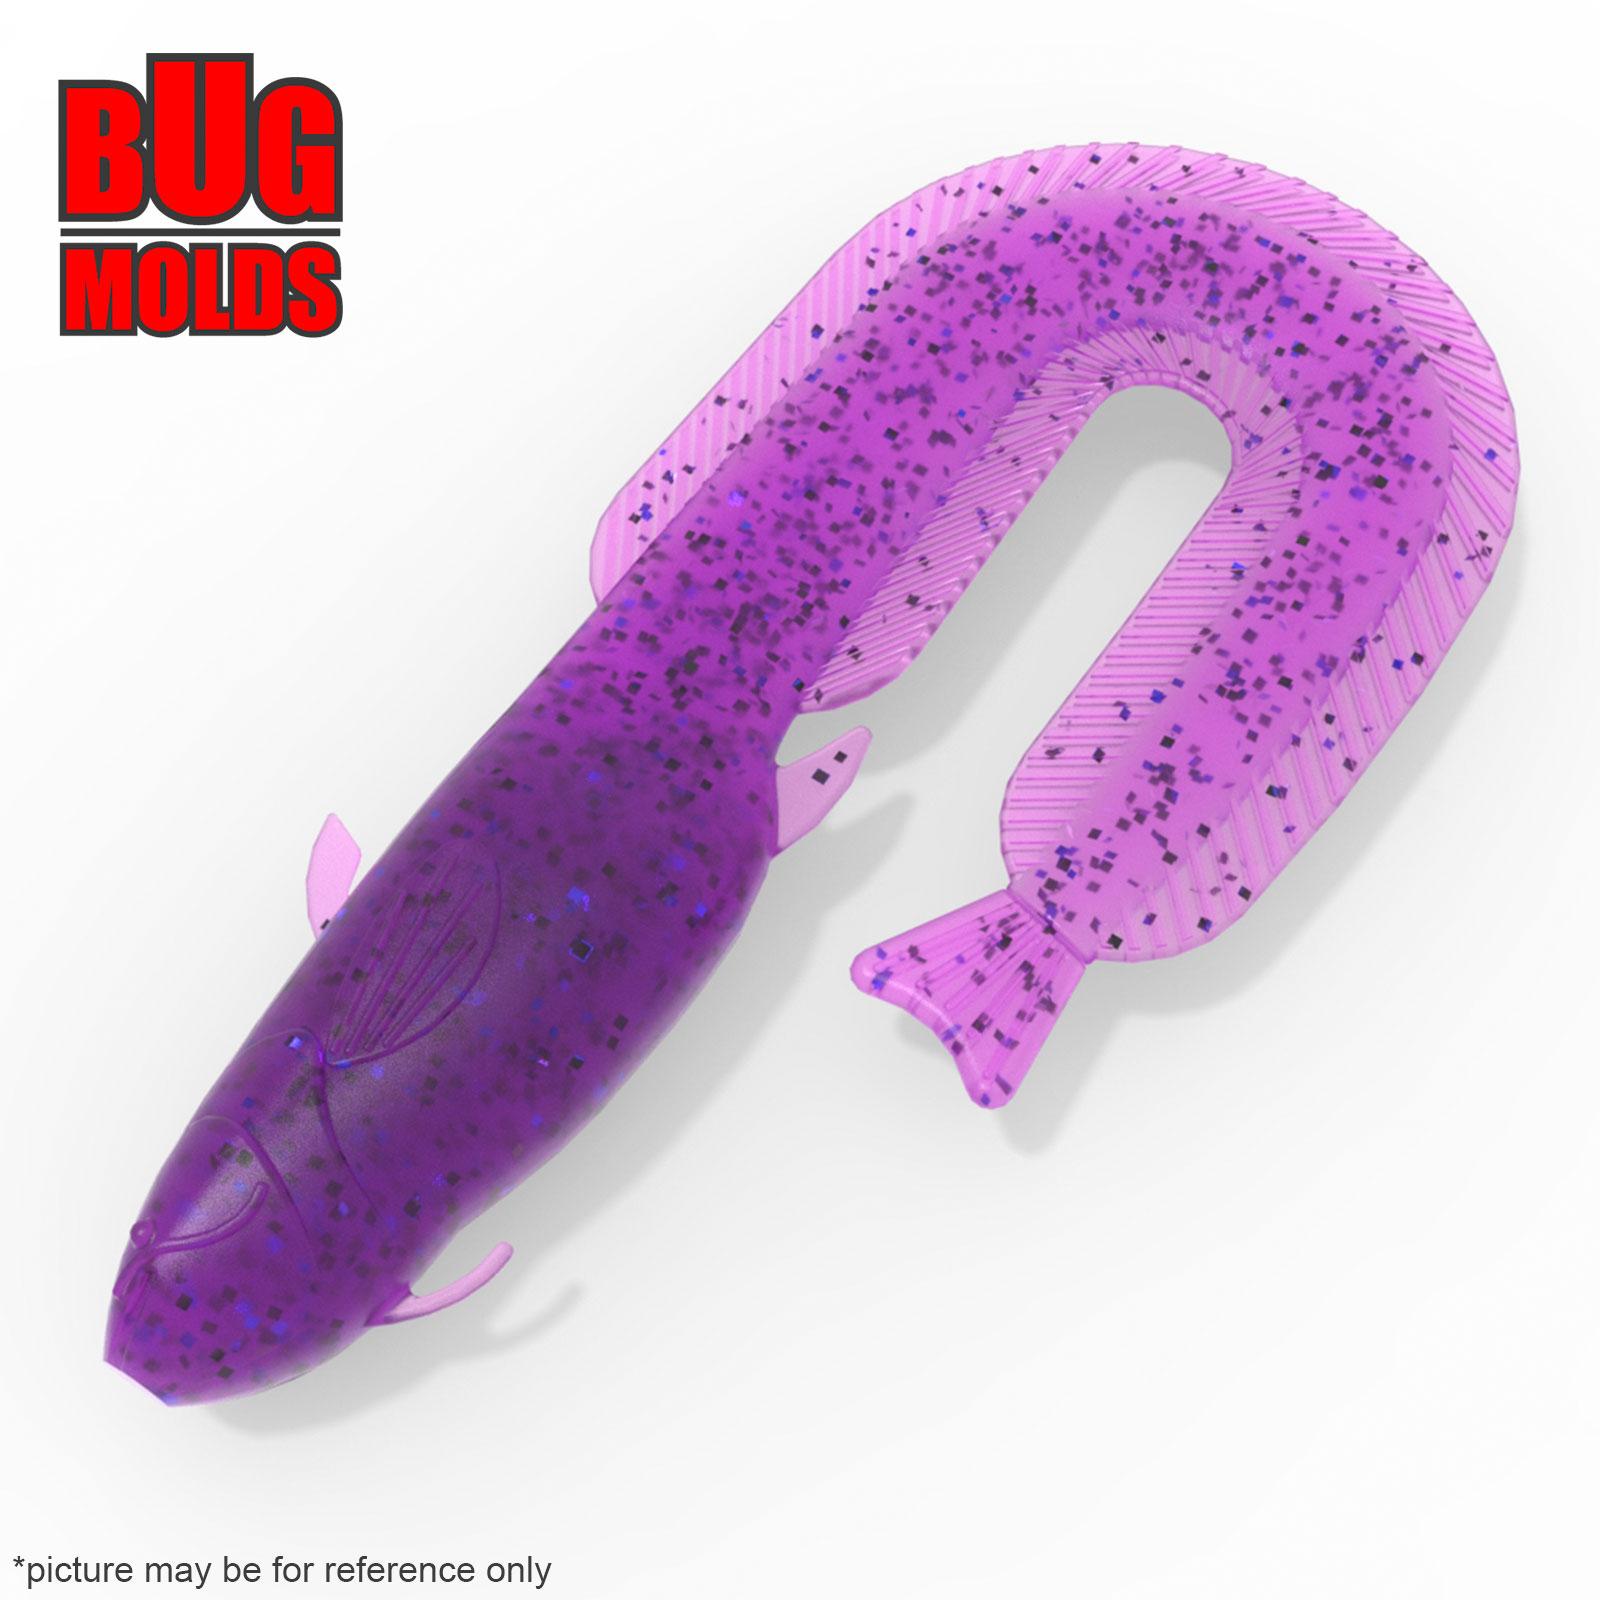 Stone plastic soft bait mold Catfish 4,5 inch model T202